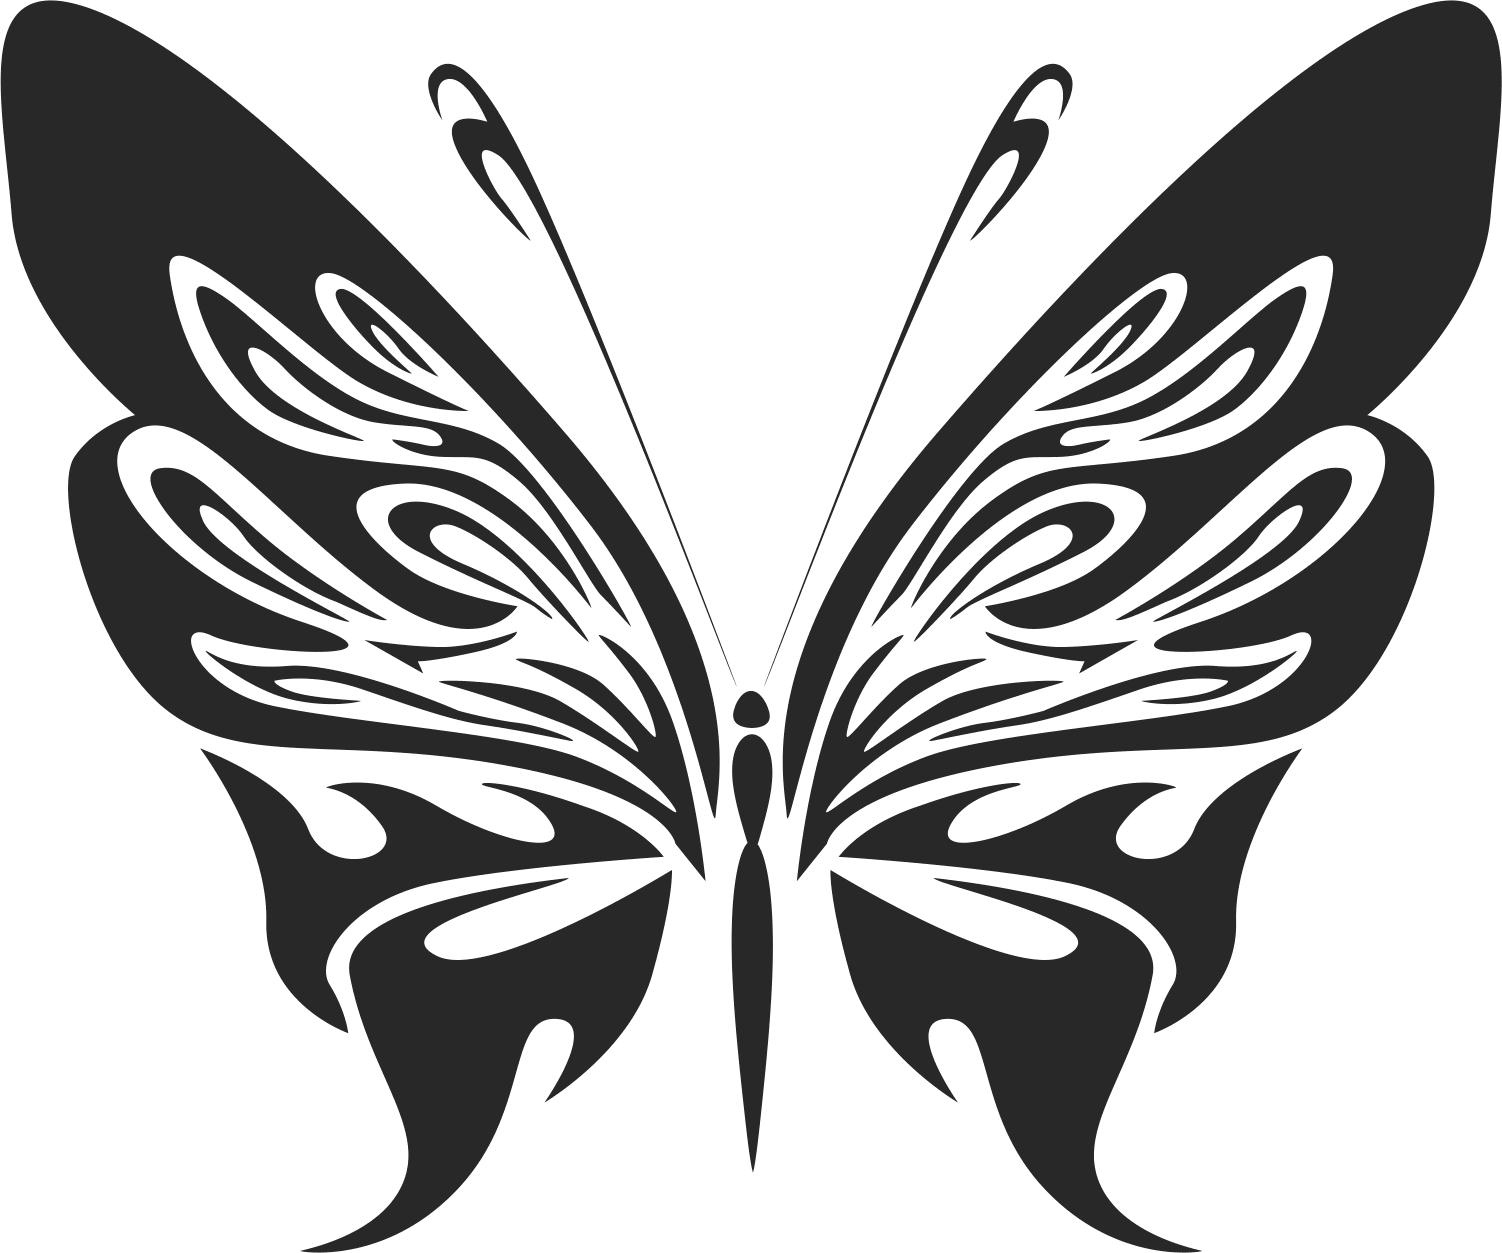 Butterfly Silhouette Sticker 222 Free CDR Vectors Art